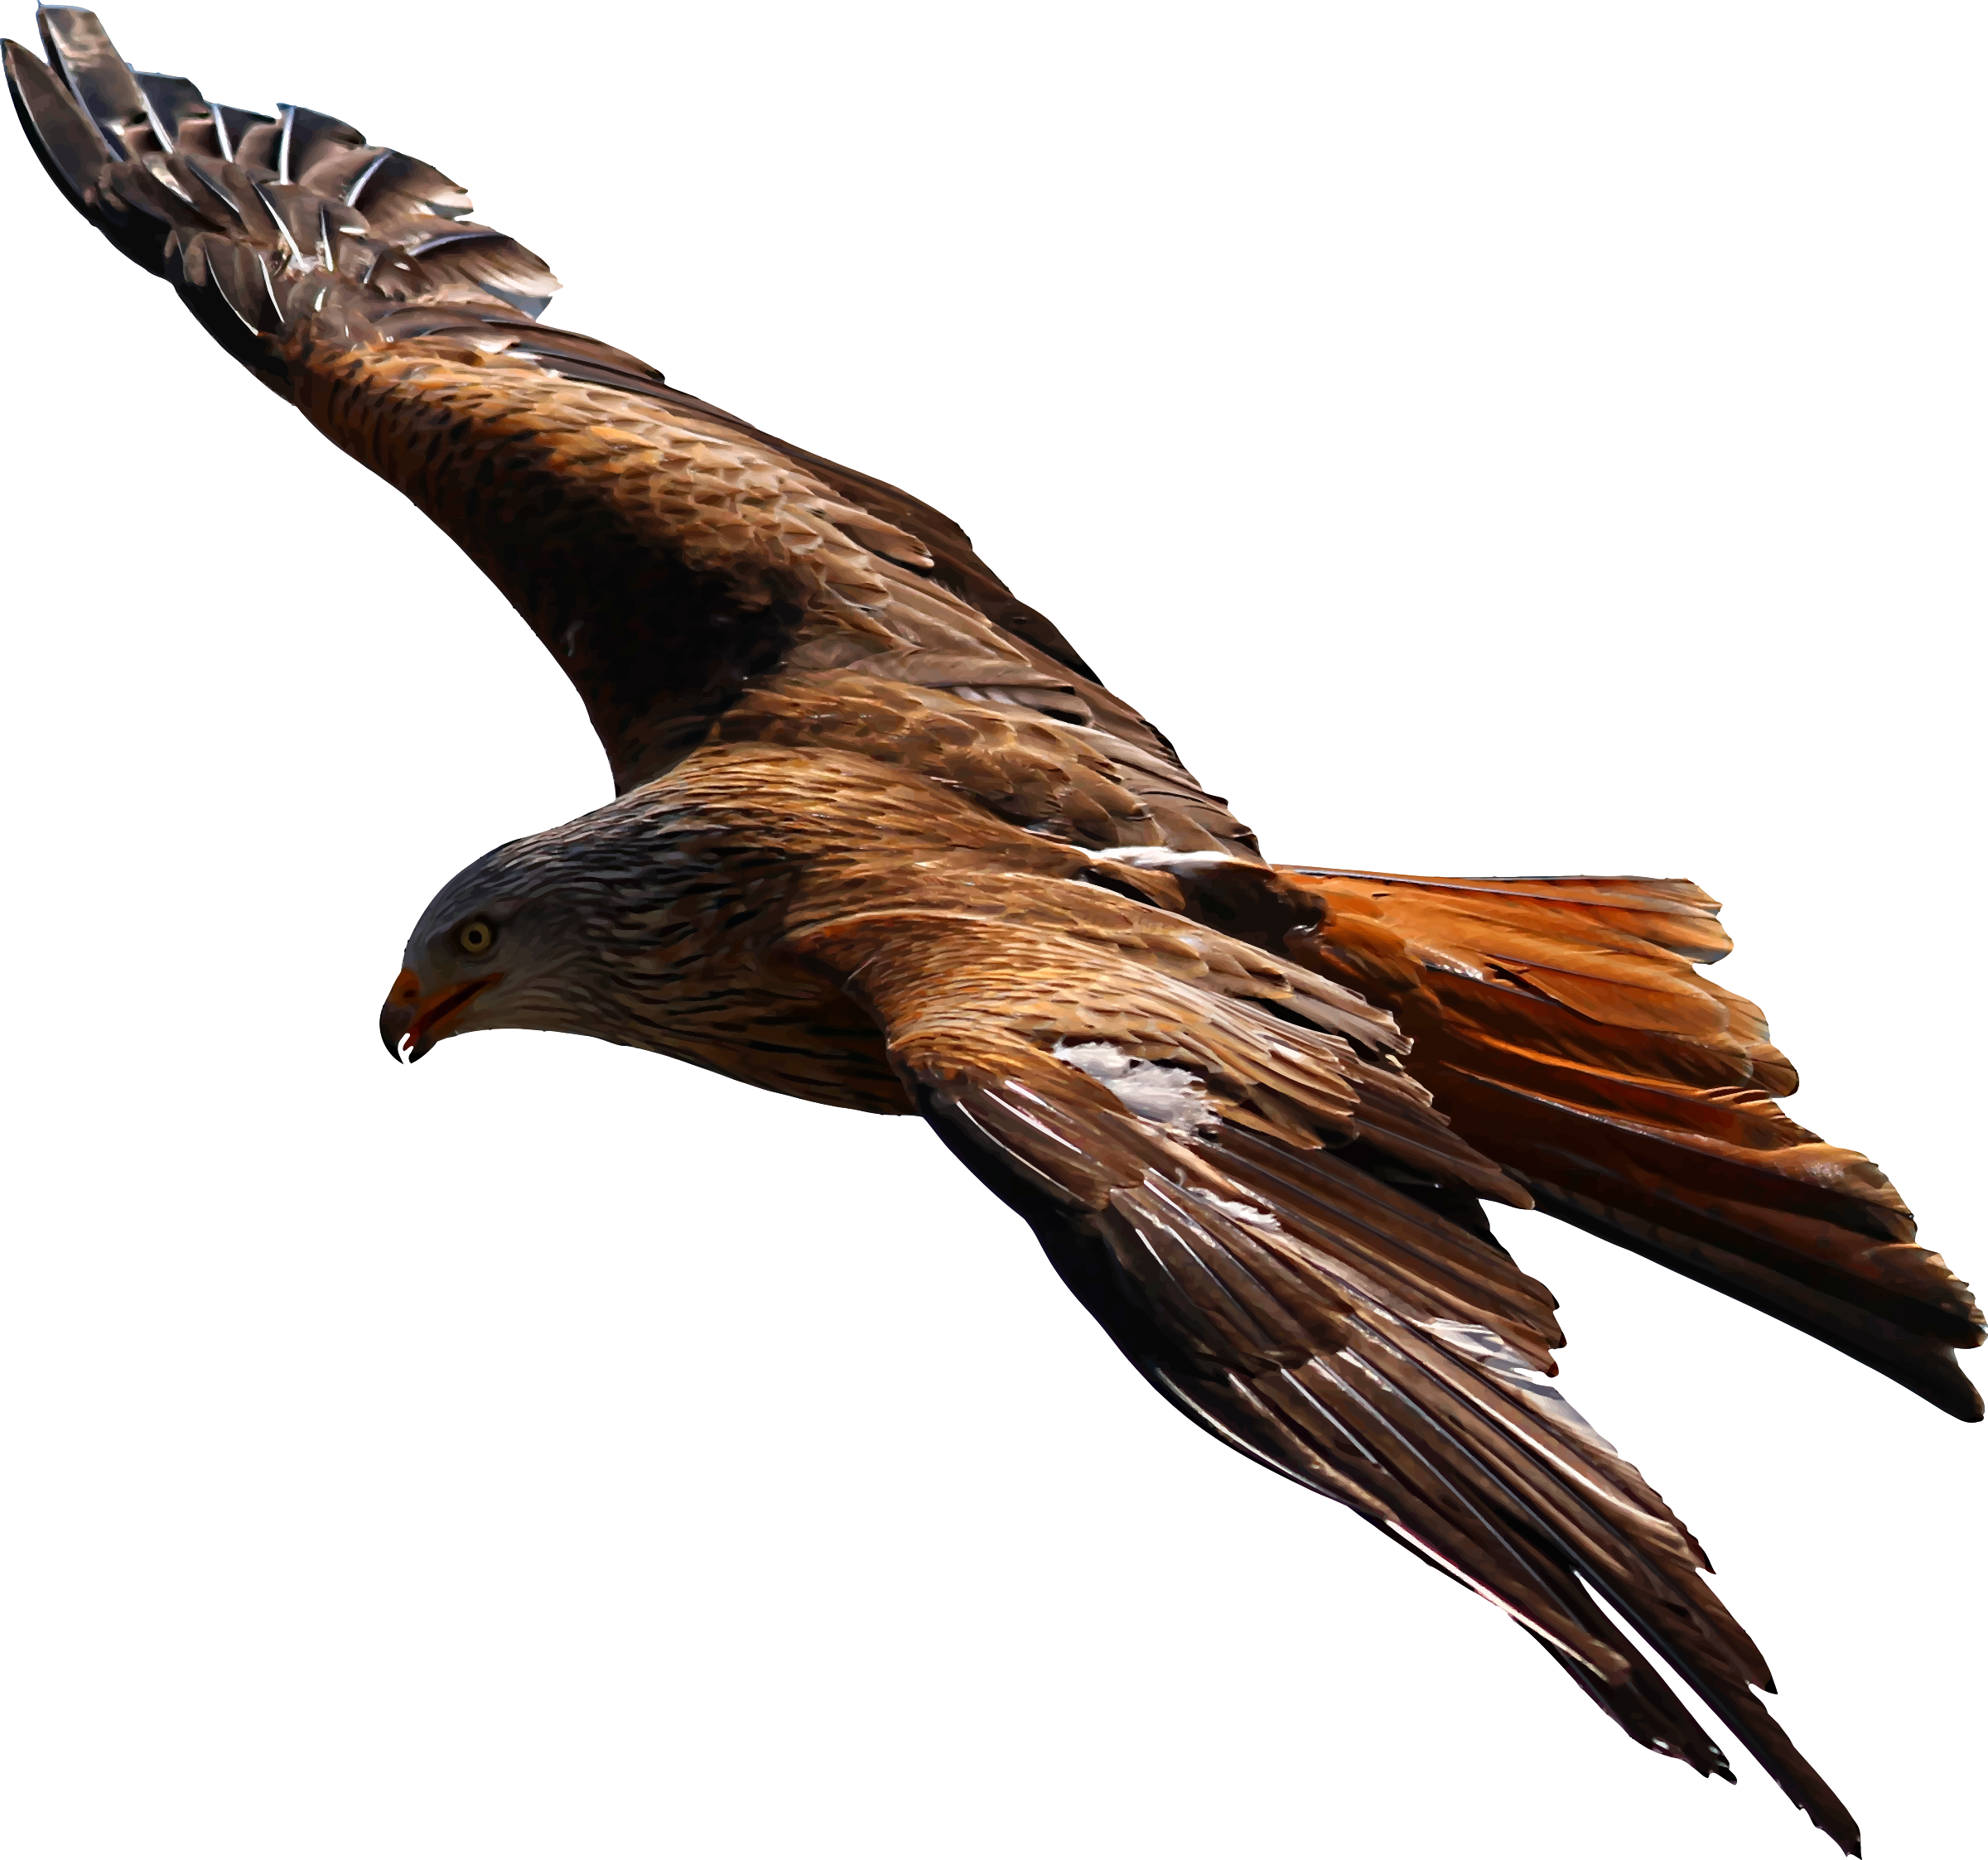 Flying Eagle Vector file image - Free stock photo - Public ... - Flying Eagle Vector Art